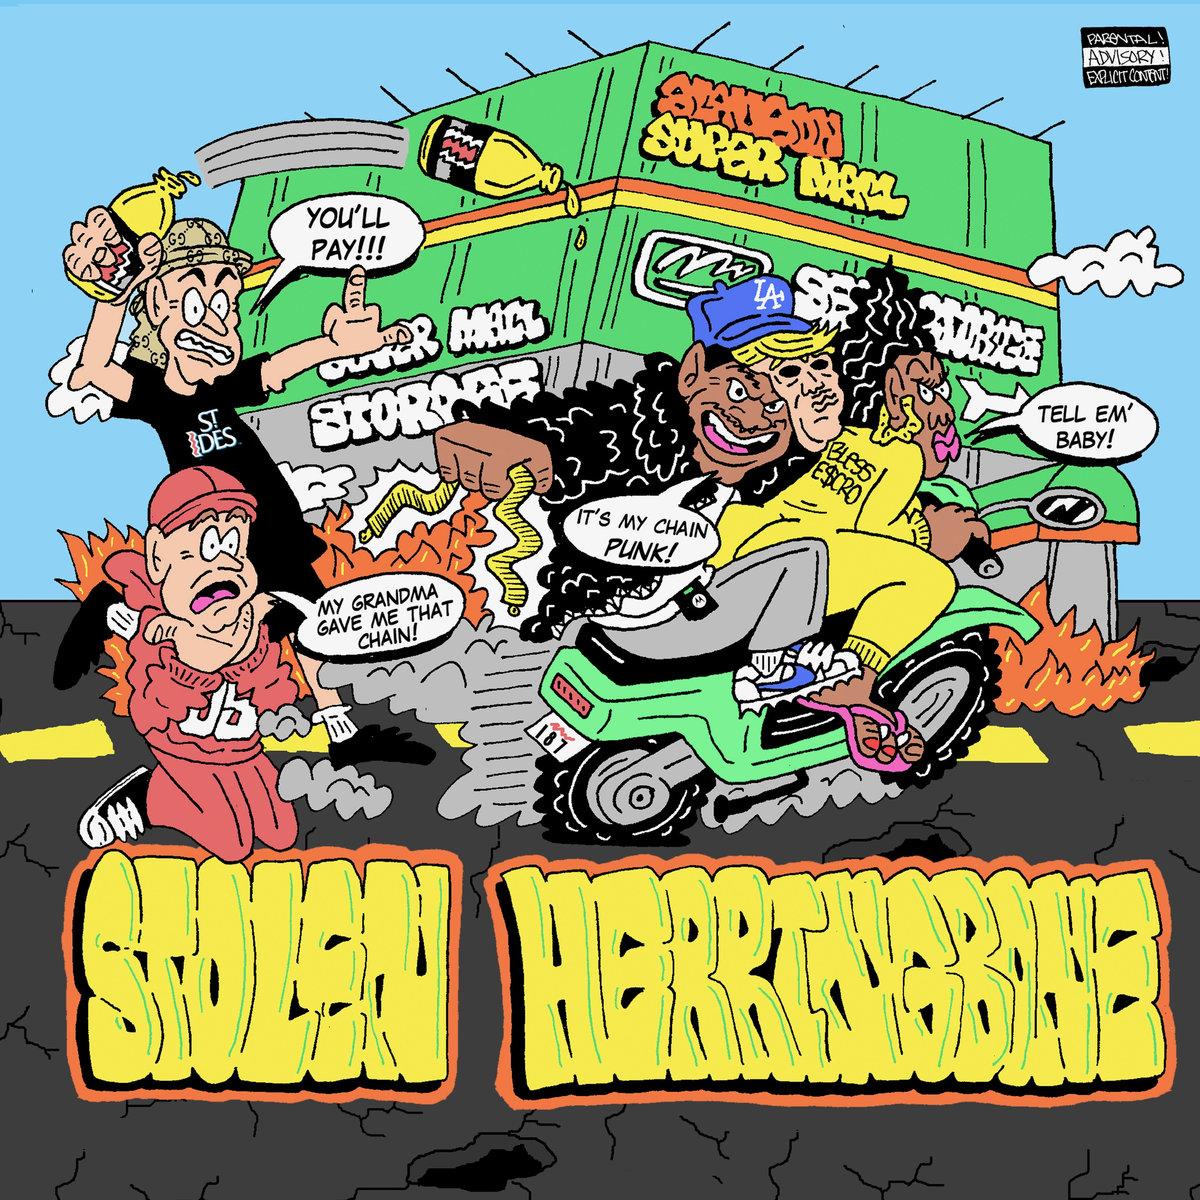 Bless Escro's 'Stolen Herringbone' cover art